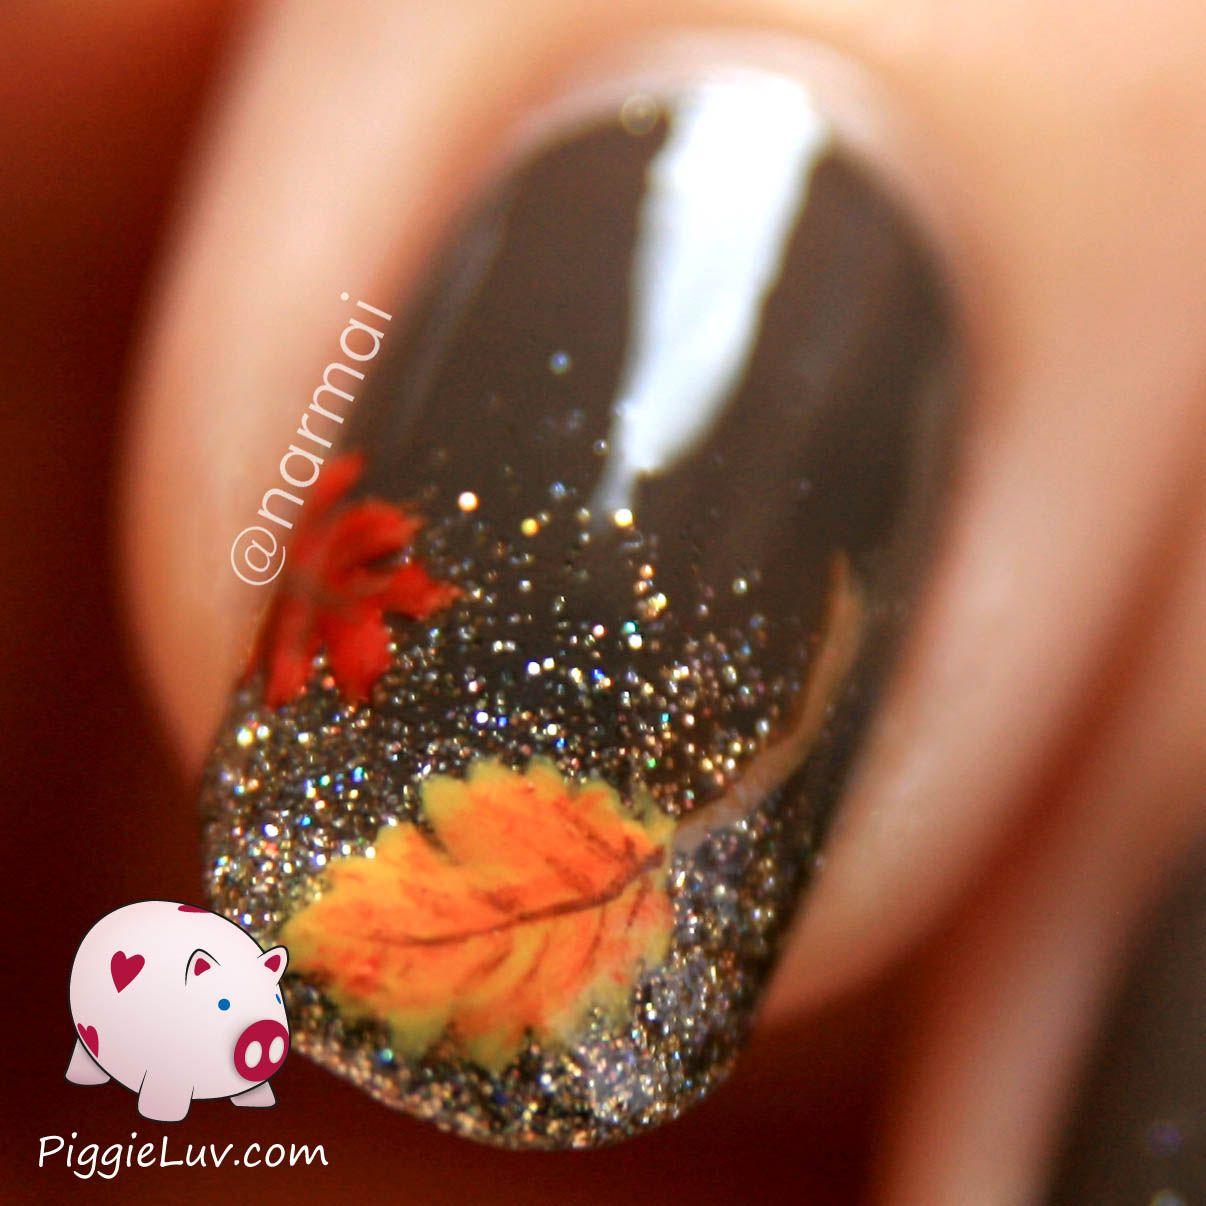 Fall Nail Art Autumn Leaves On Glitter Gradient Fall Nail Art Designs Fall Nail Art Fall Nail Designs